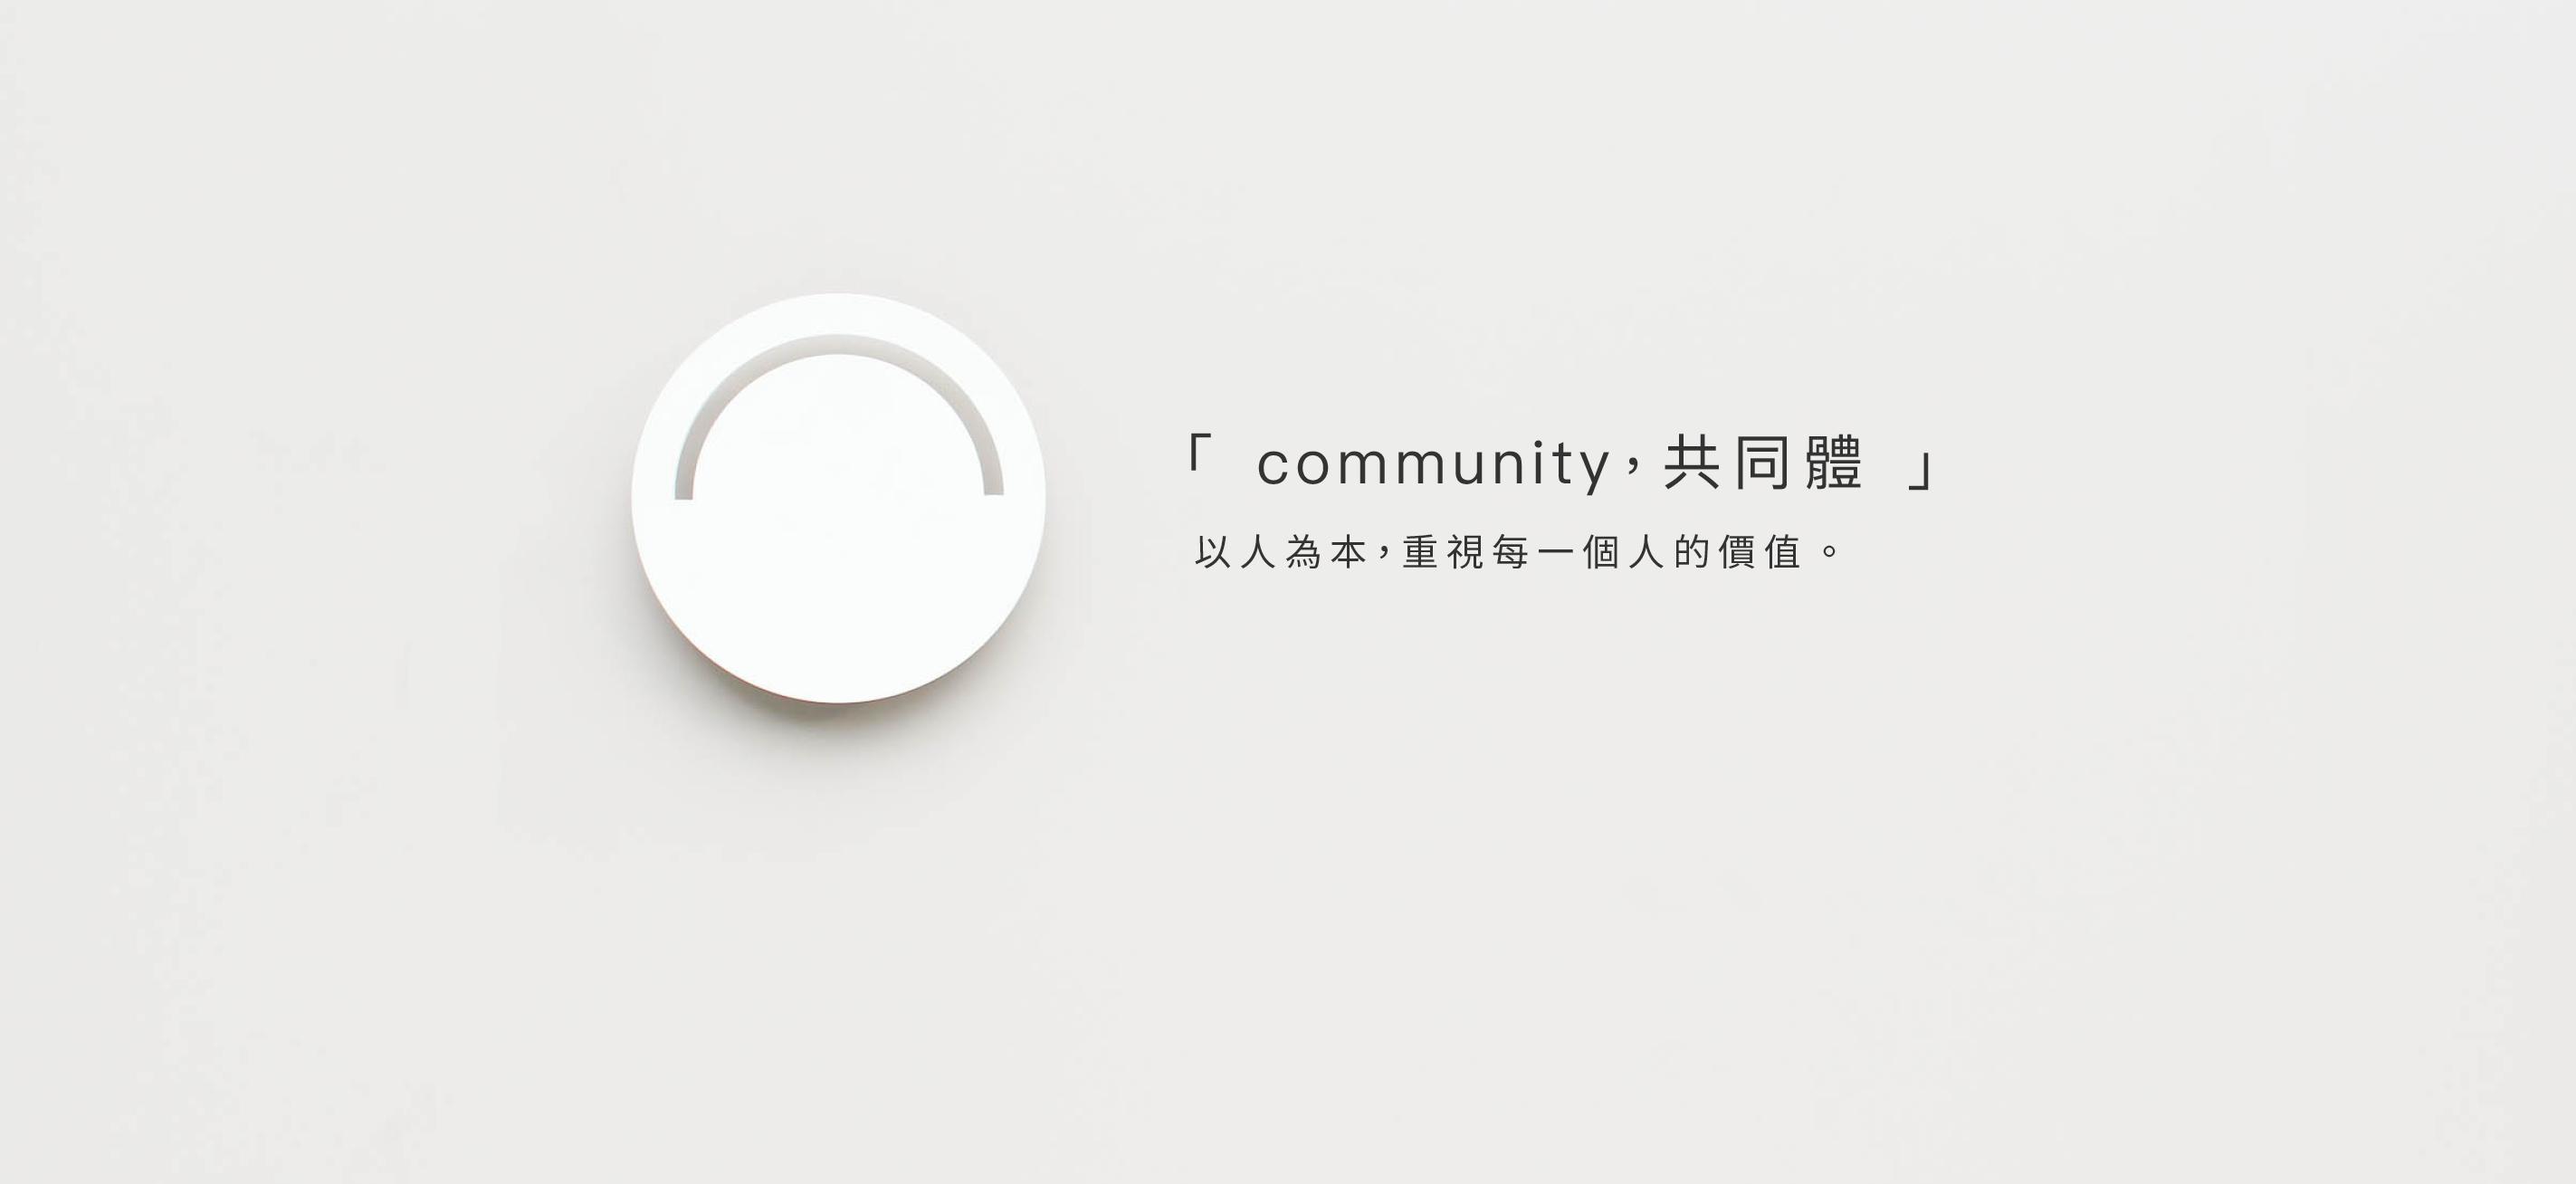 「 community,共同體 」